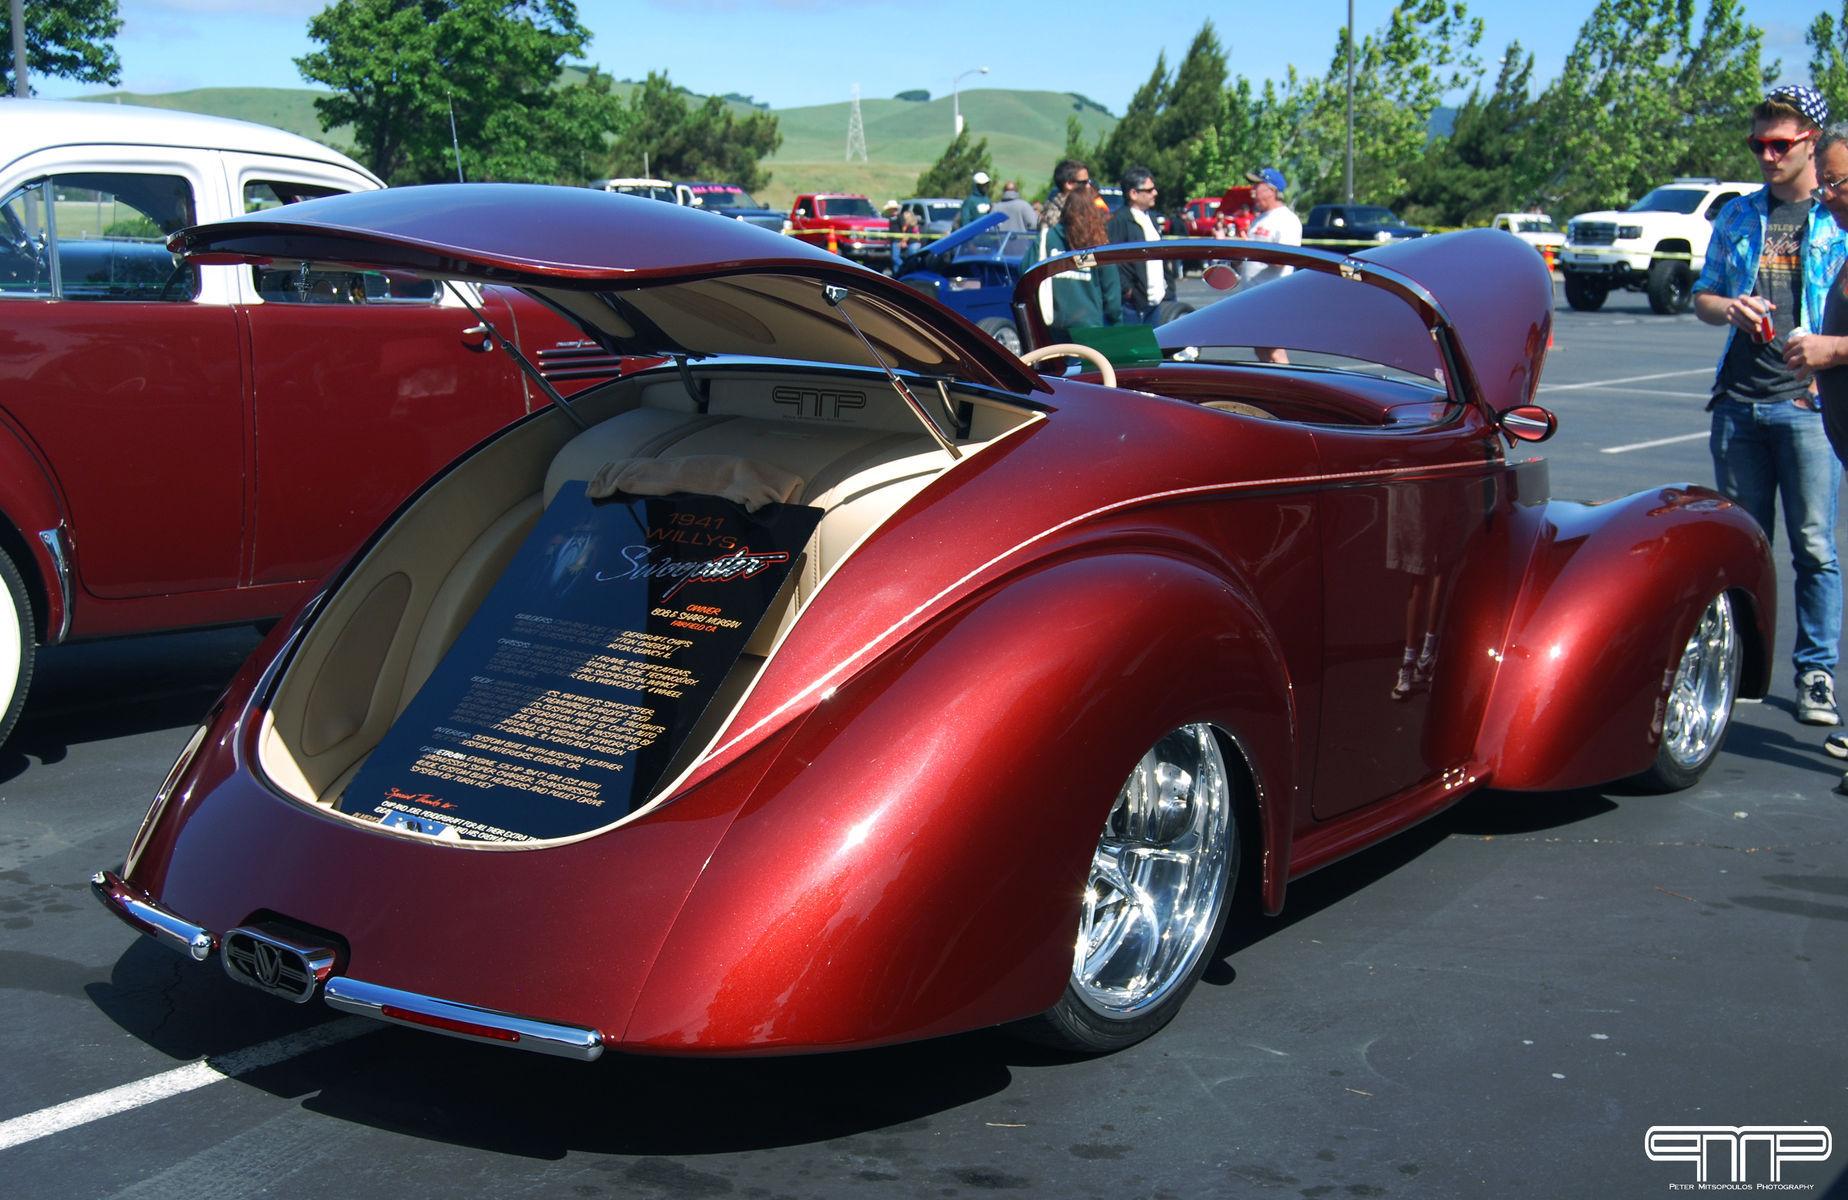   Willys Custom Hot Rod